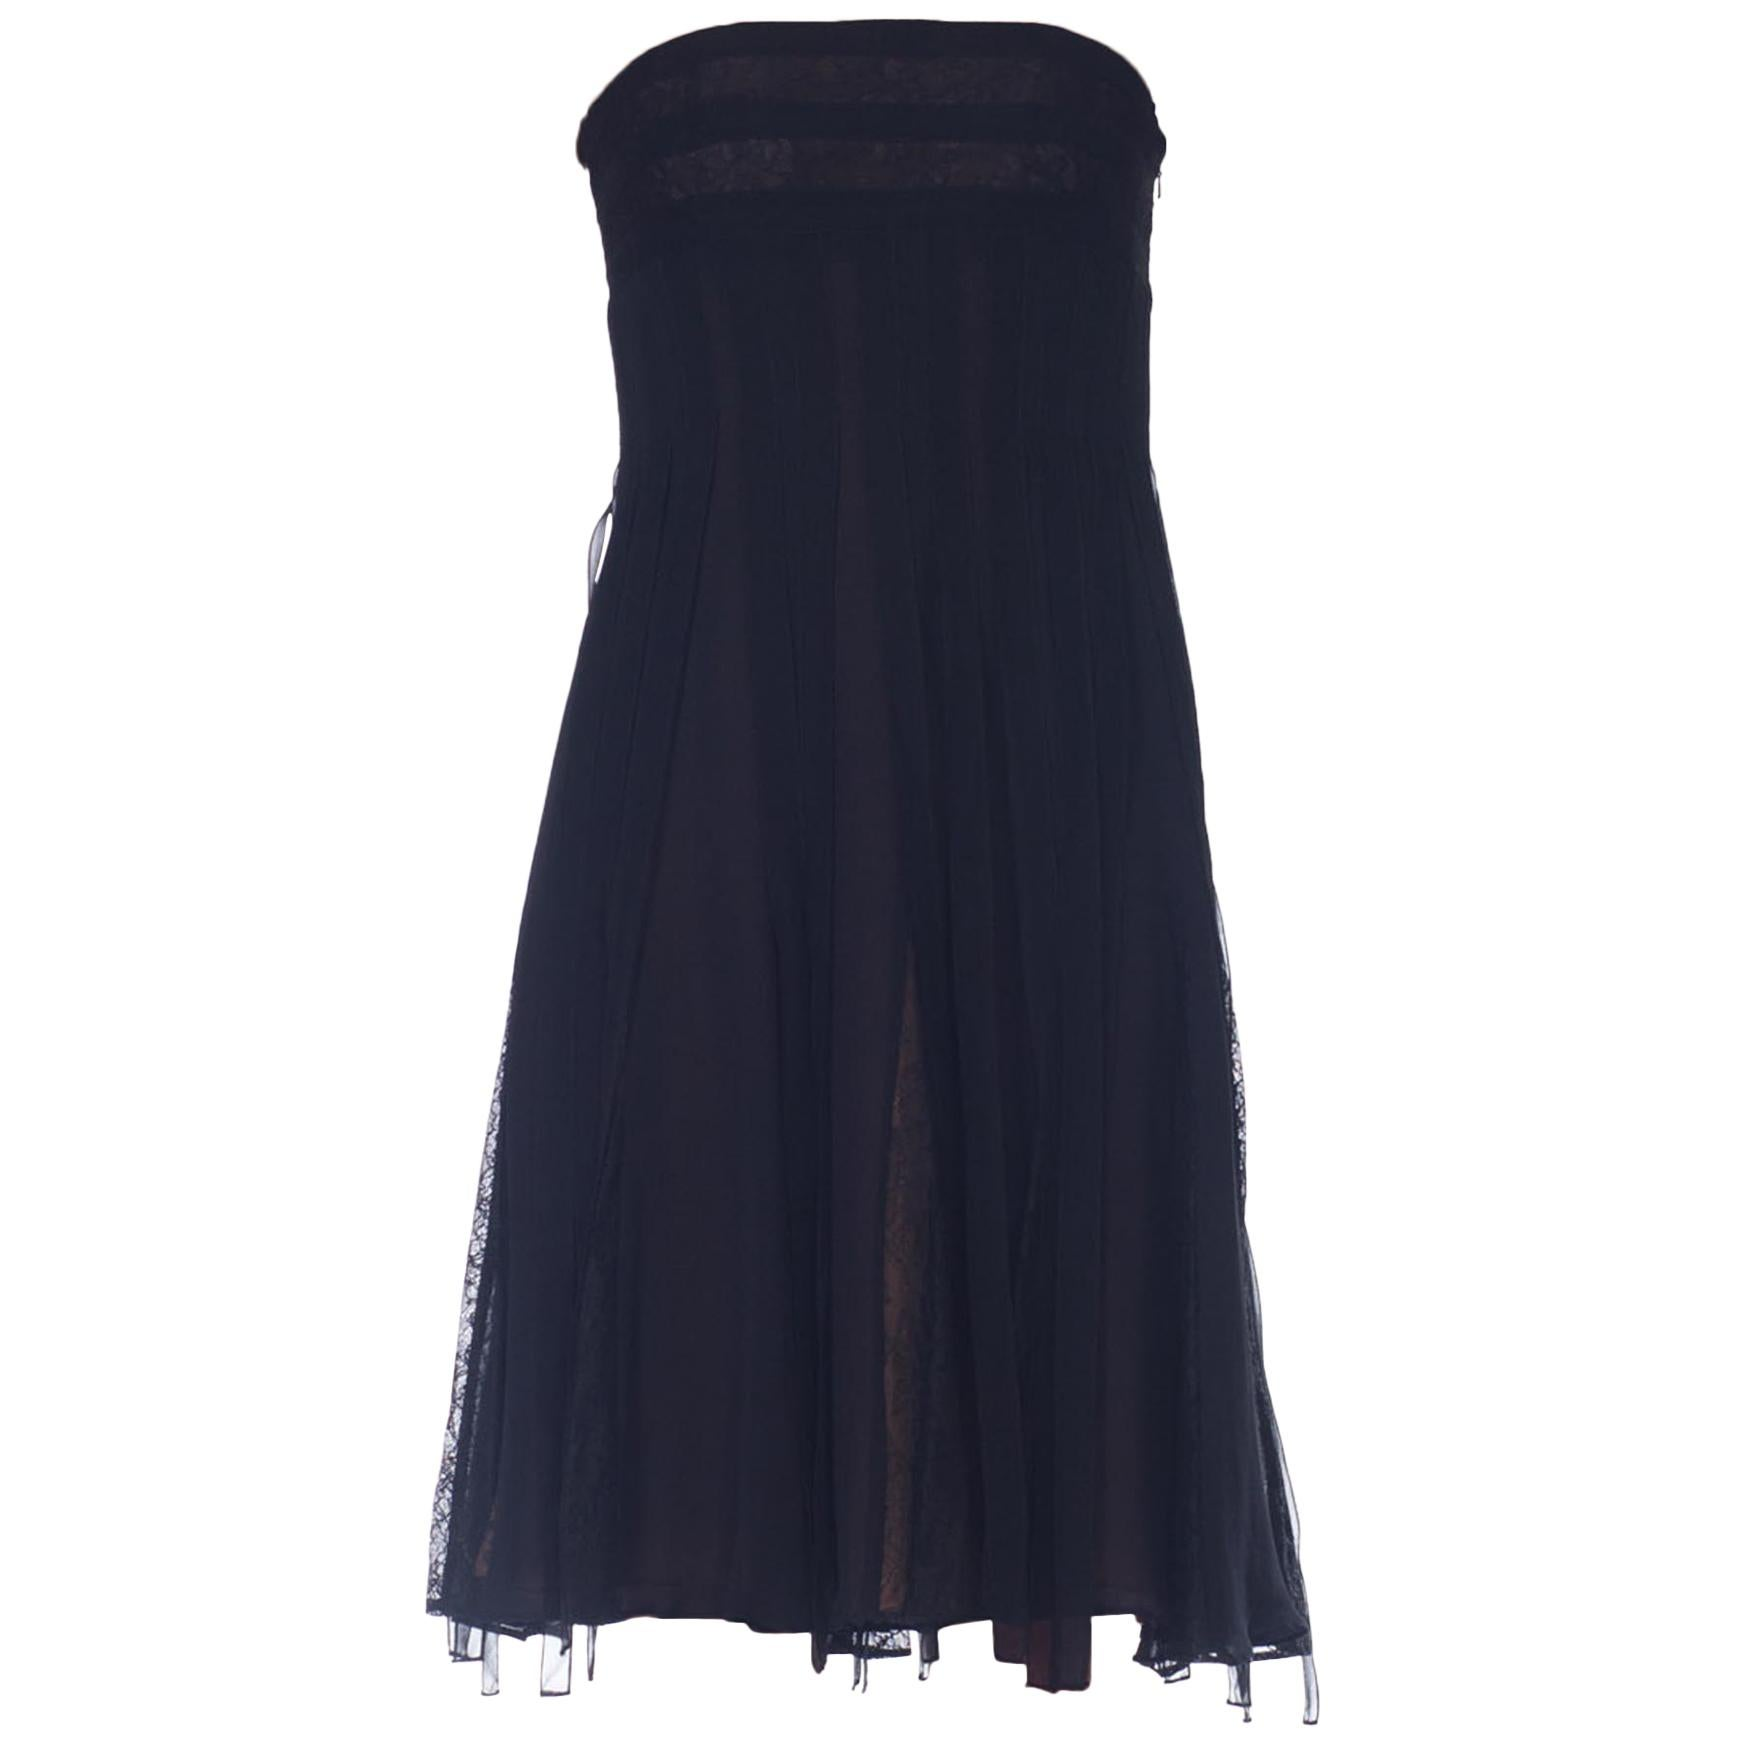 1990S CARMEN MARC VALVO Black Strapless Silk Chiffon & Lace Carwash Skirt Cockt